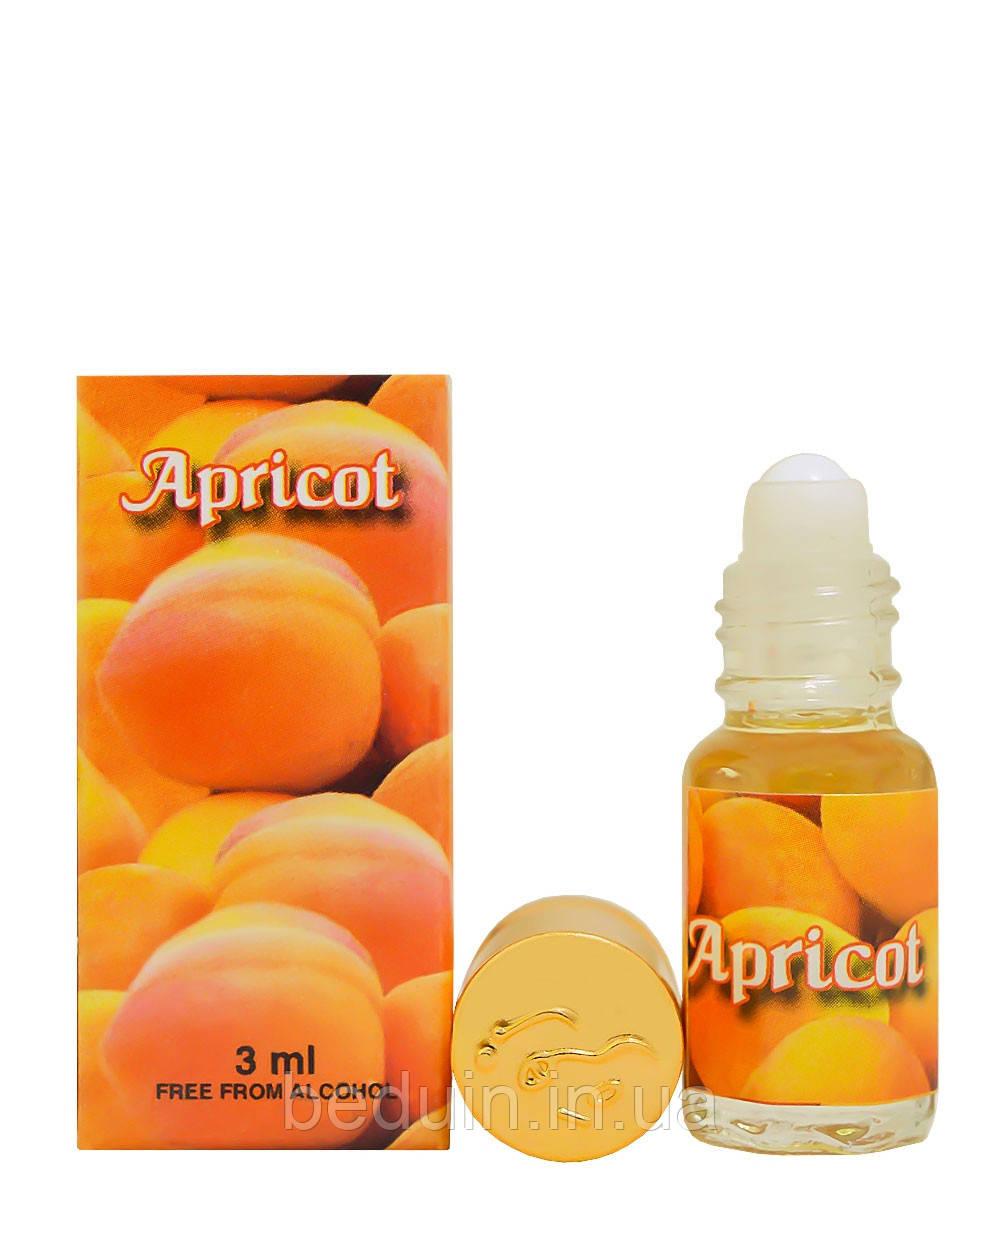 apricot_3_ml.jpg